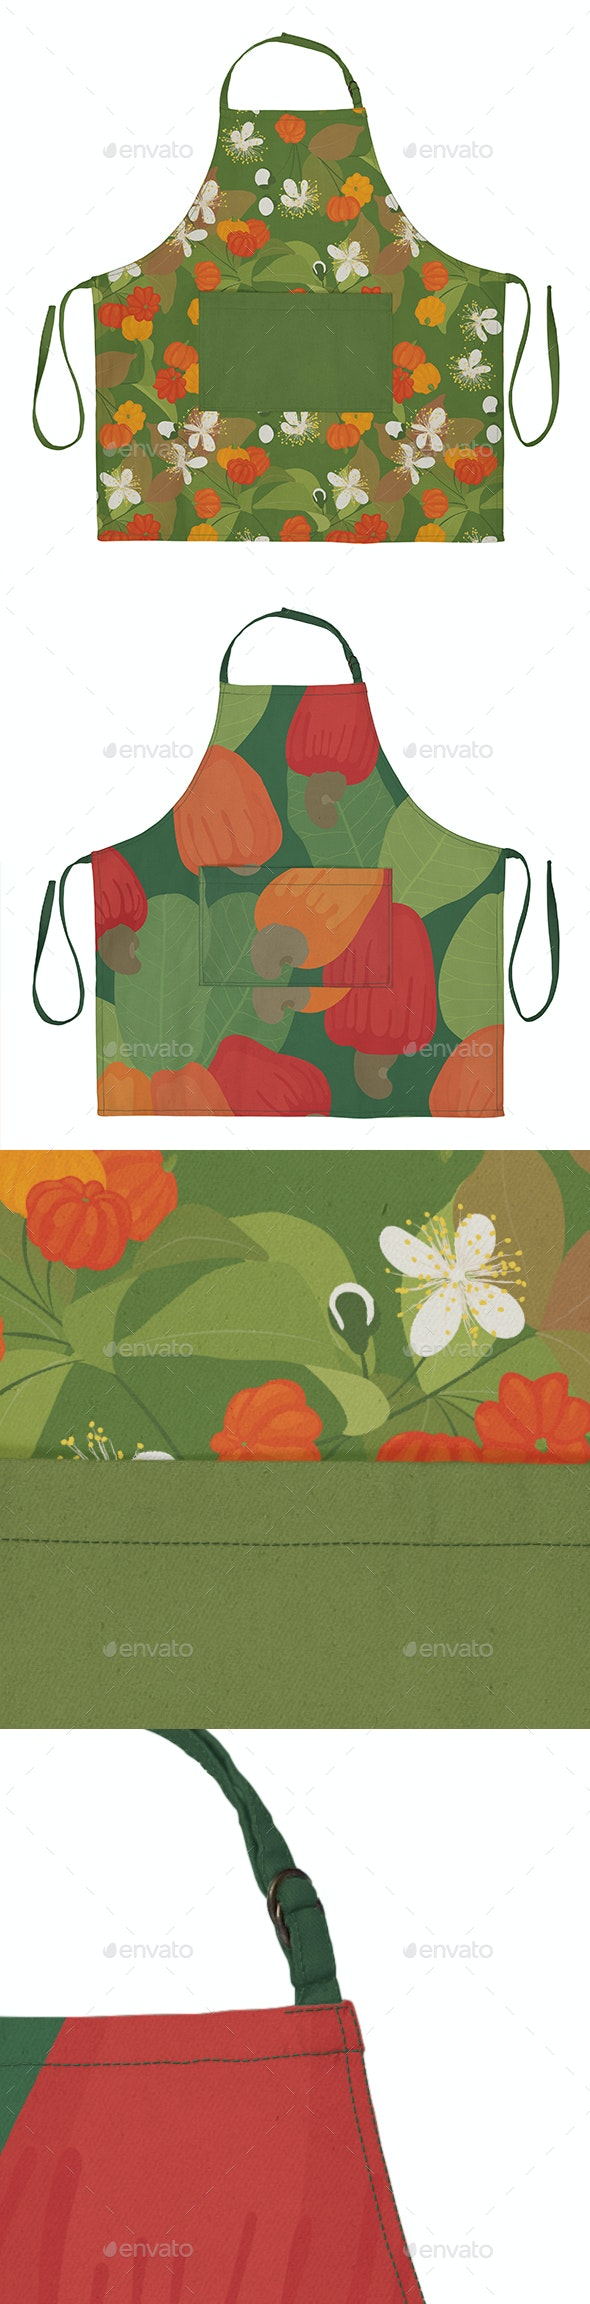 Canvas Apron Mockup - Miscellaneous Apparel